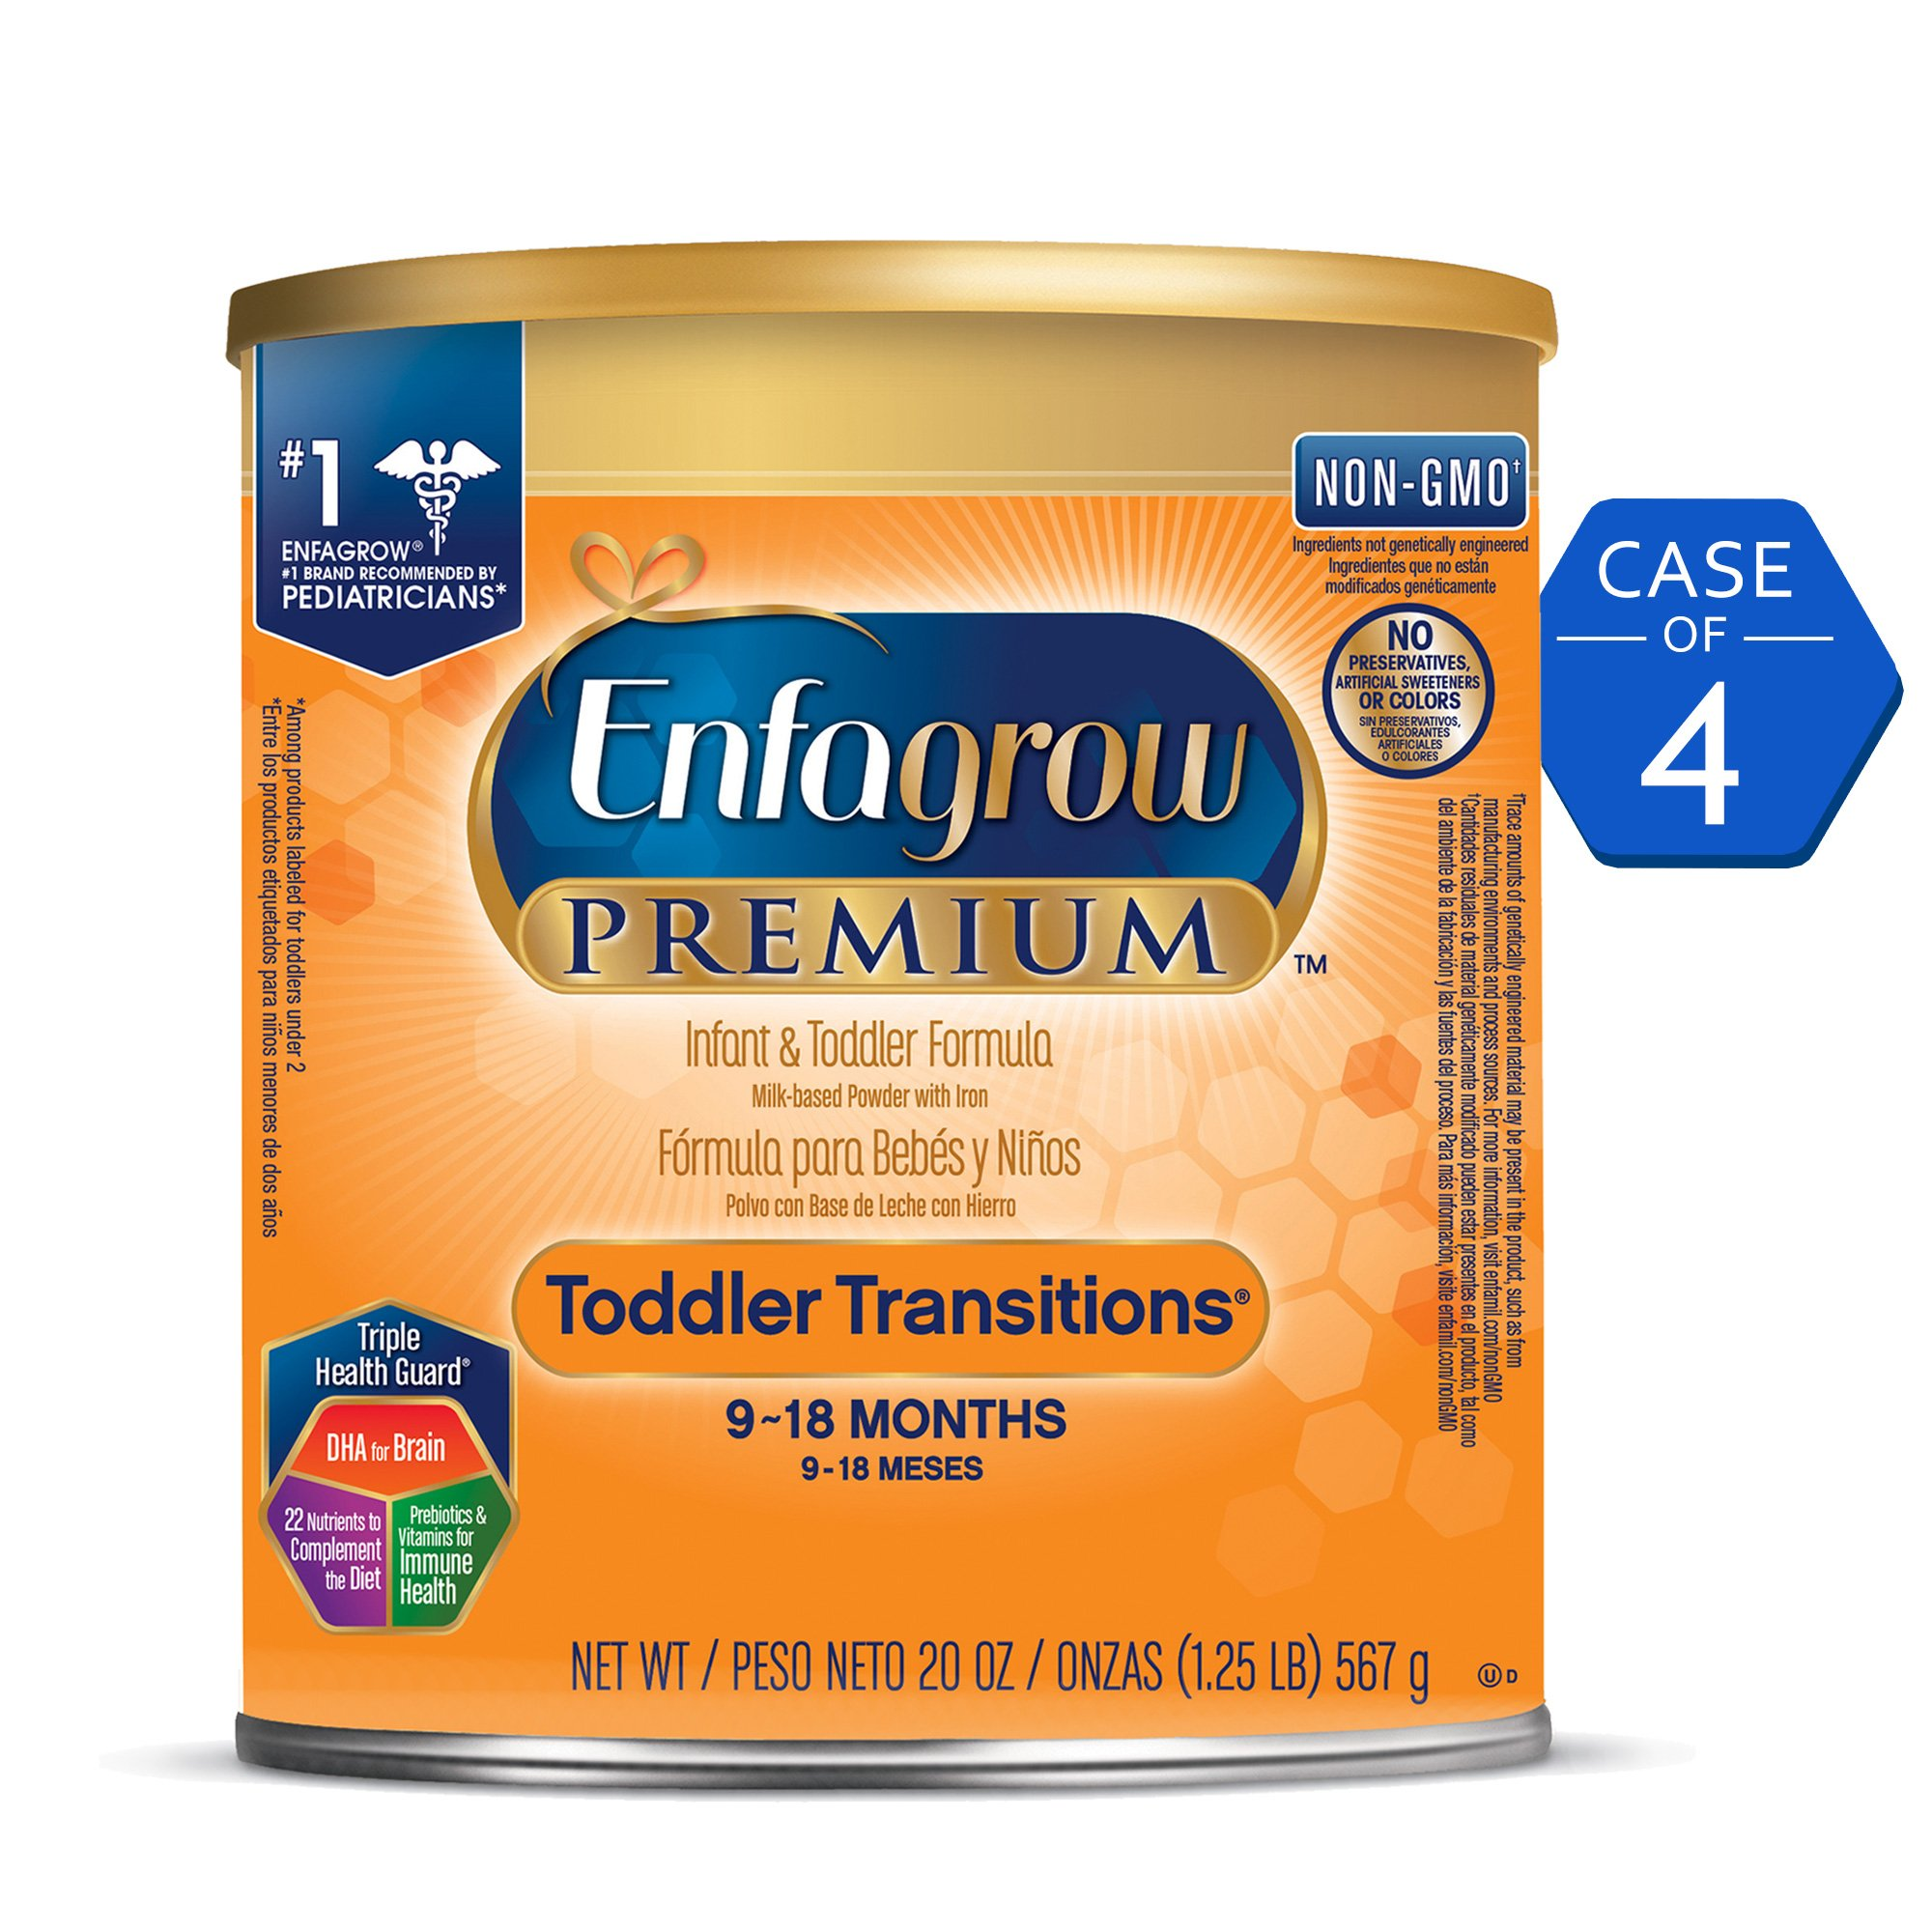 Enfagrow PREMIUM Non-GMO Toddler Transitions Formula - Powder can, 20 oz by Enfagrow Transitions